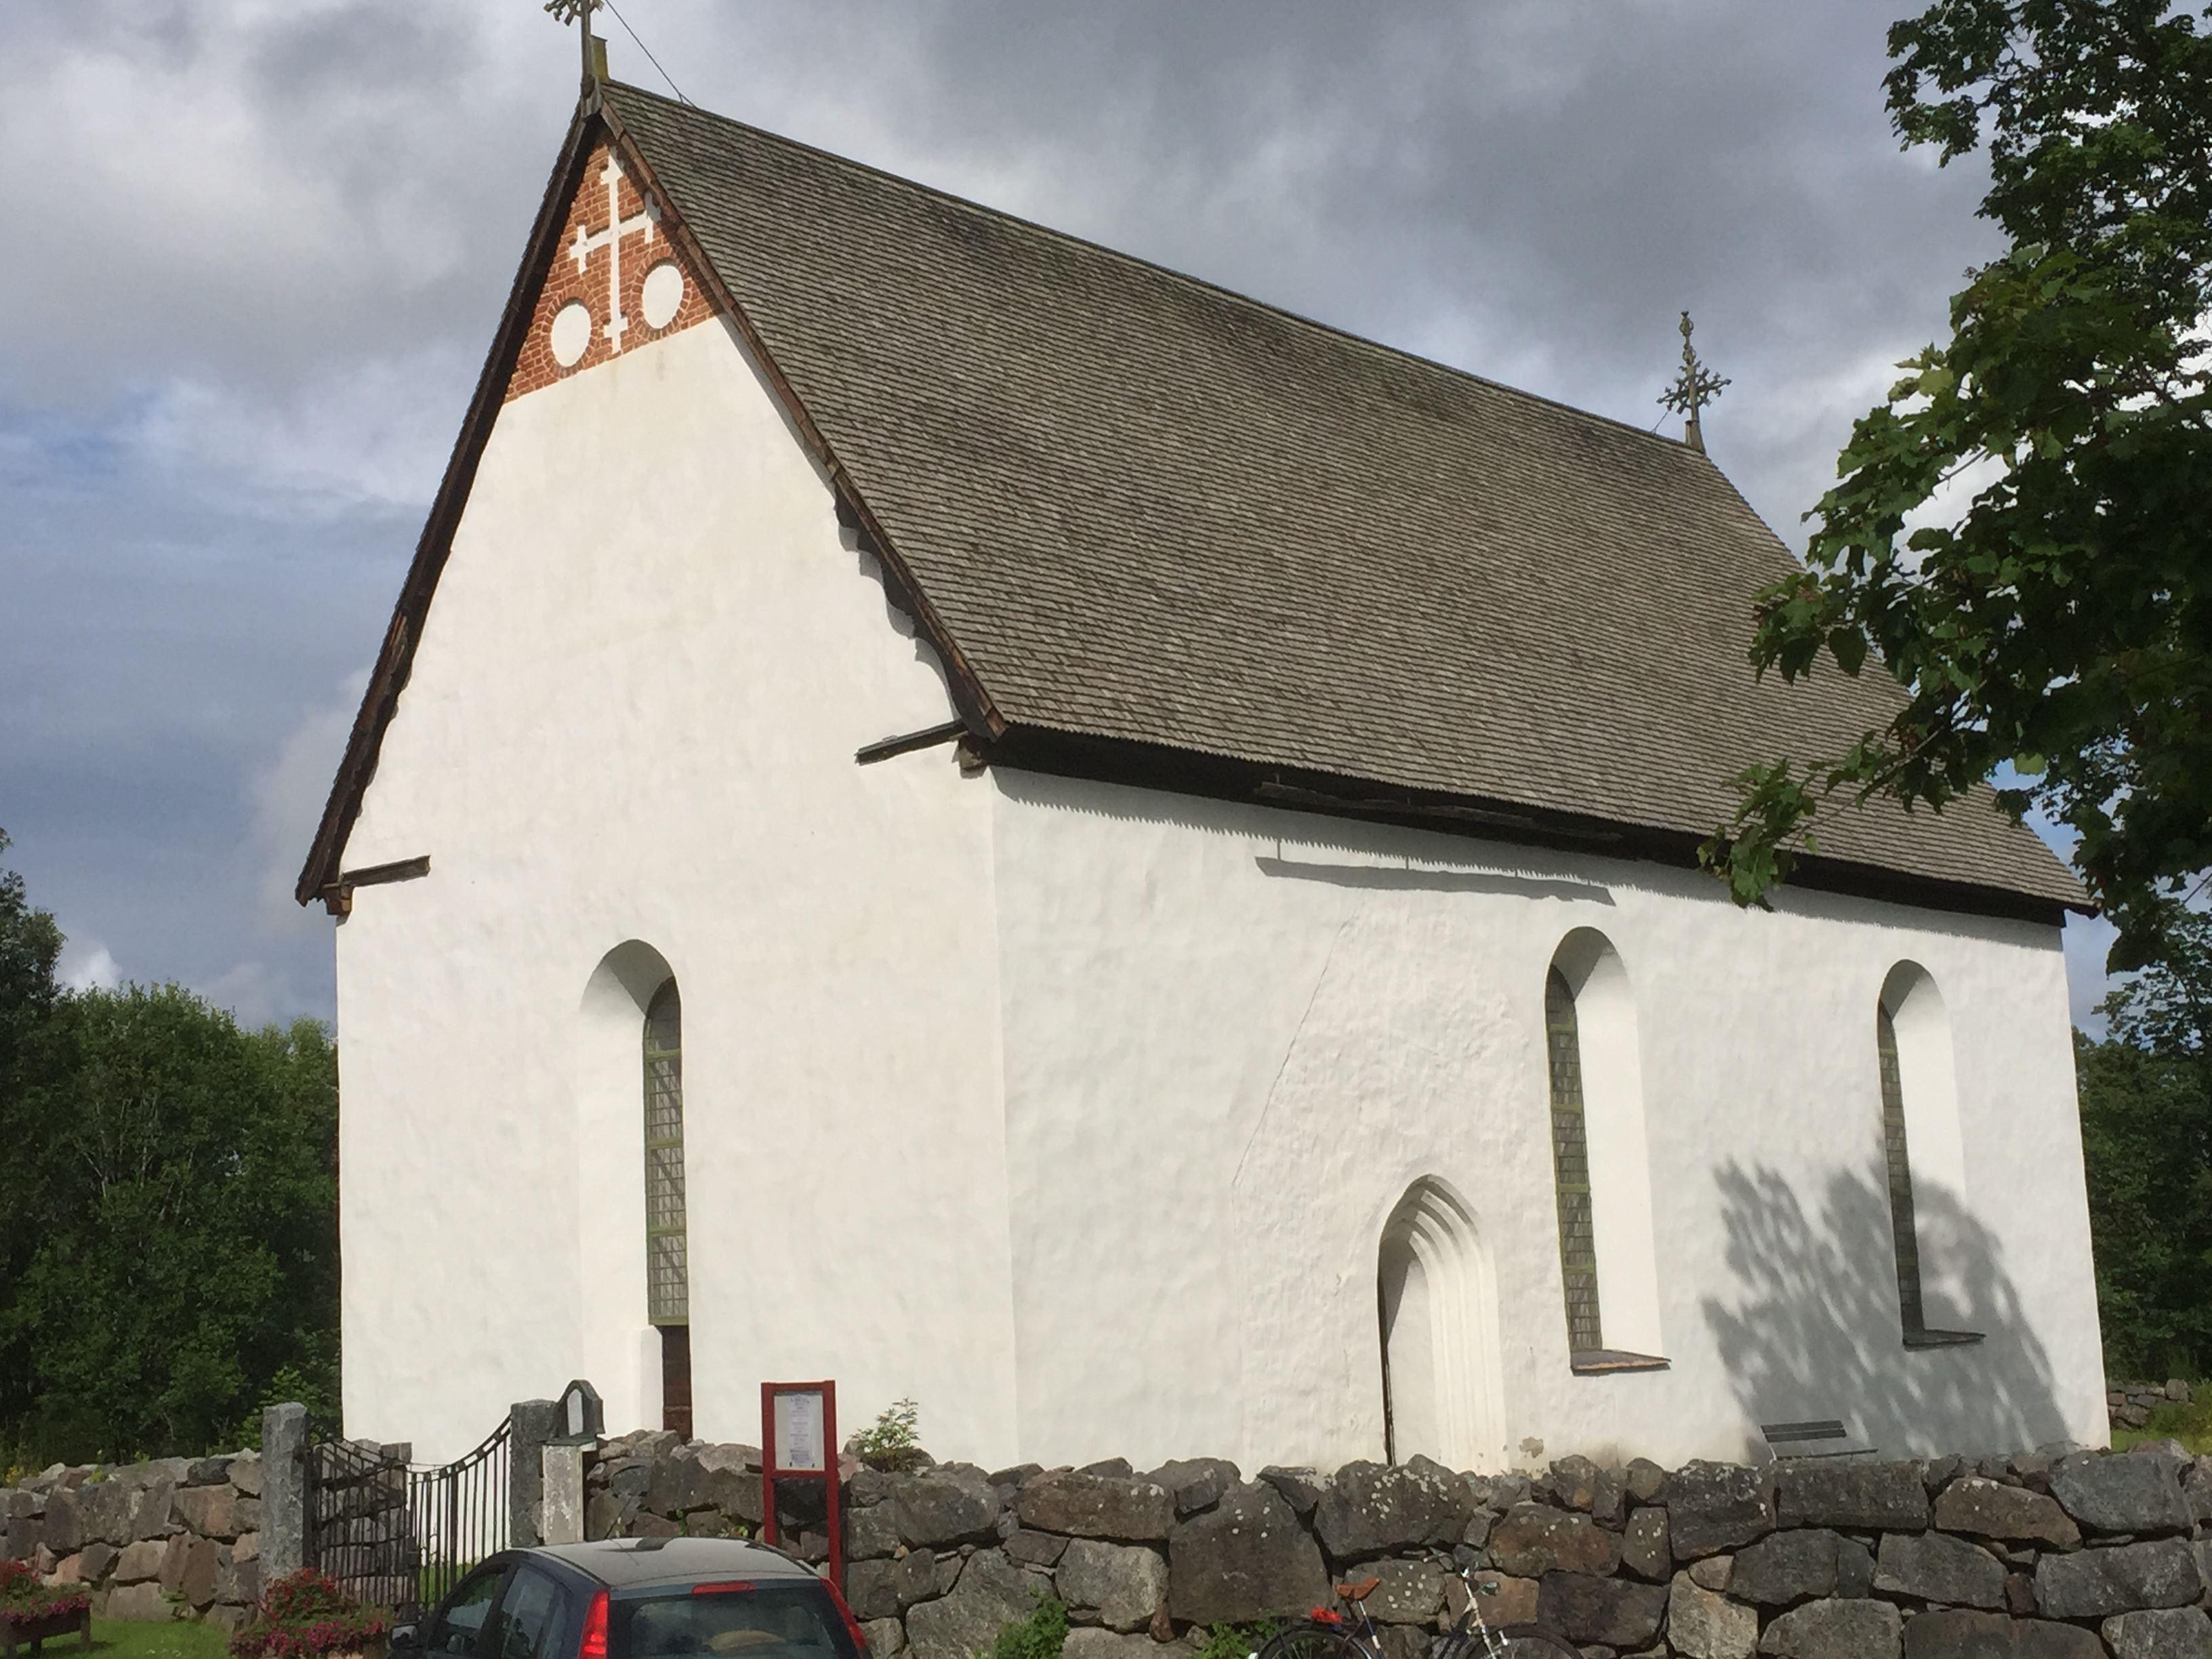 Kyrkovisning av Enångers medeltidskyrka